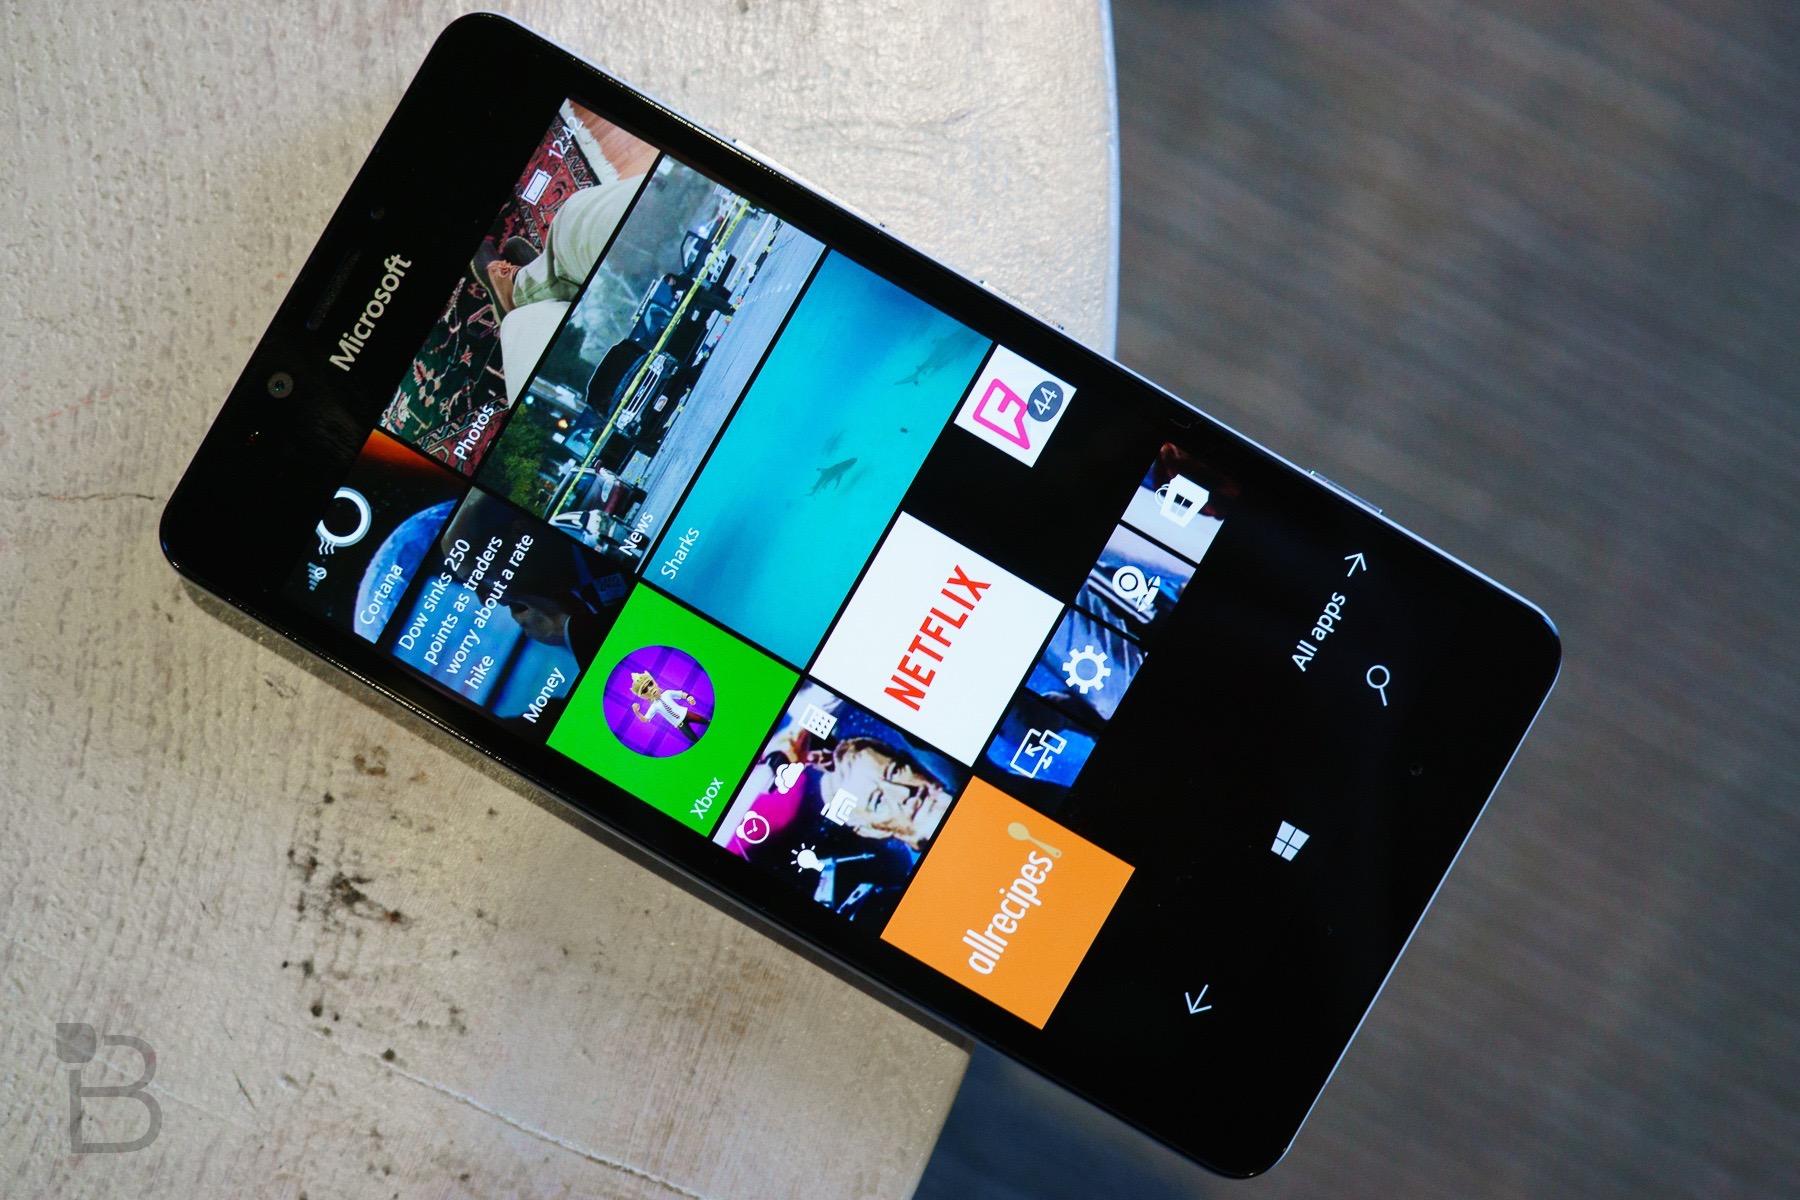 Lumia 950 wallpapers wallpapersafari for 1800x1200 window